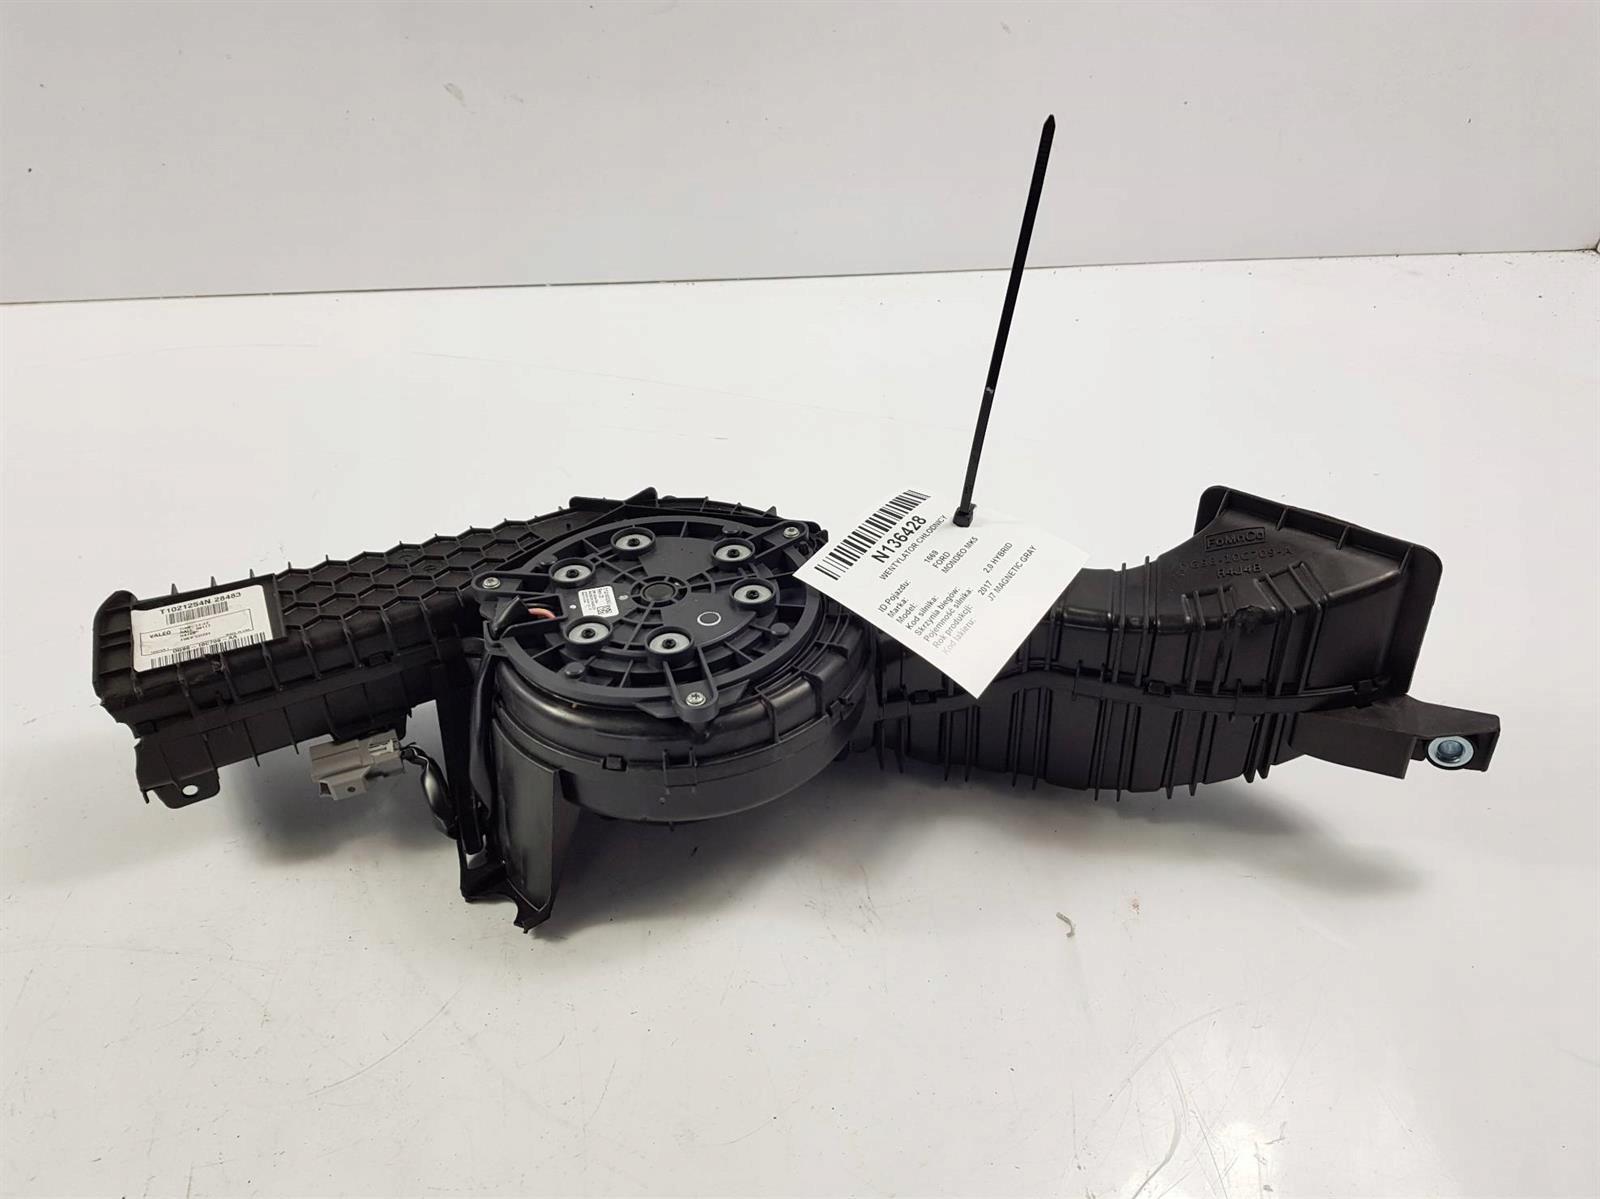 вентилятор радиатора dg98-10c709-a mondeo mk5